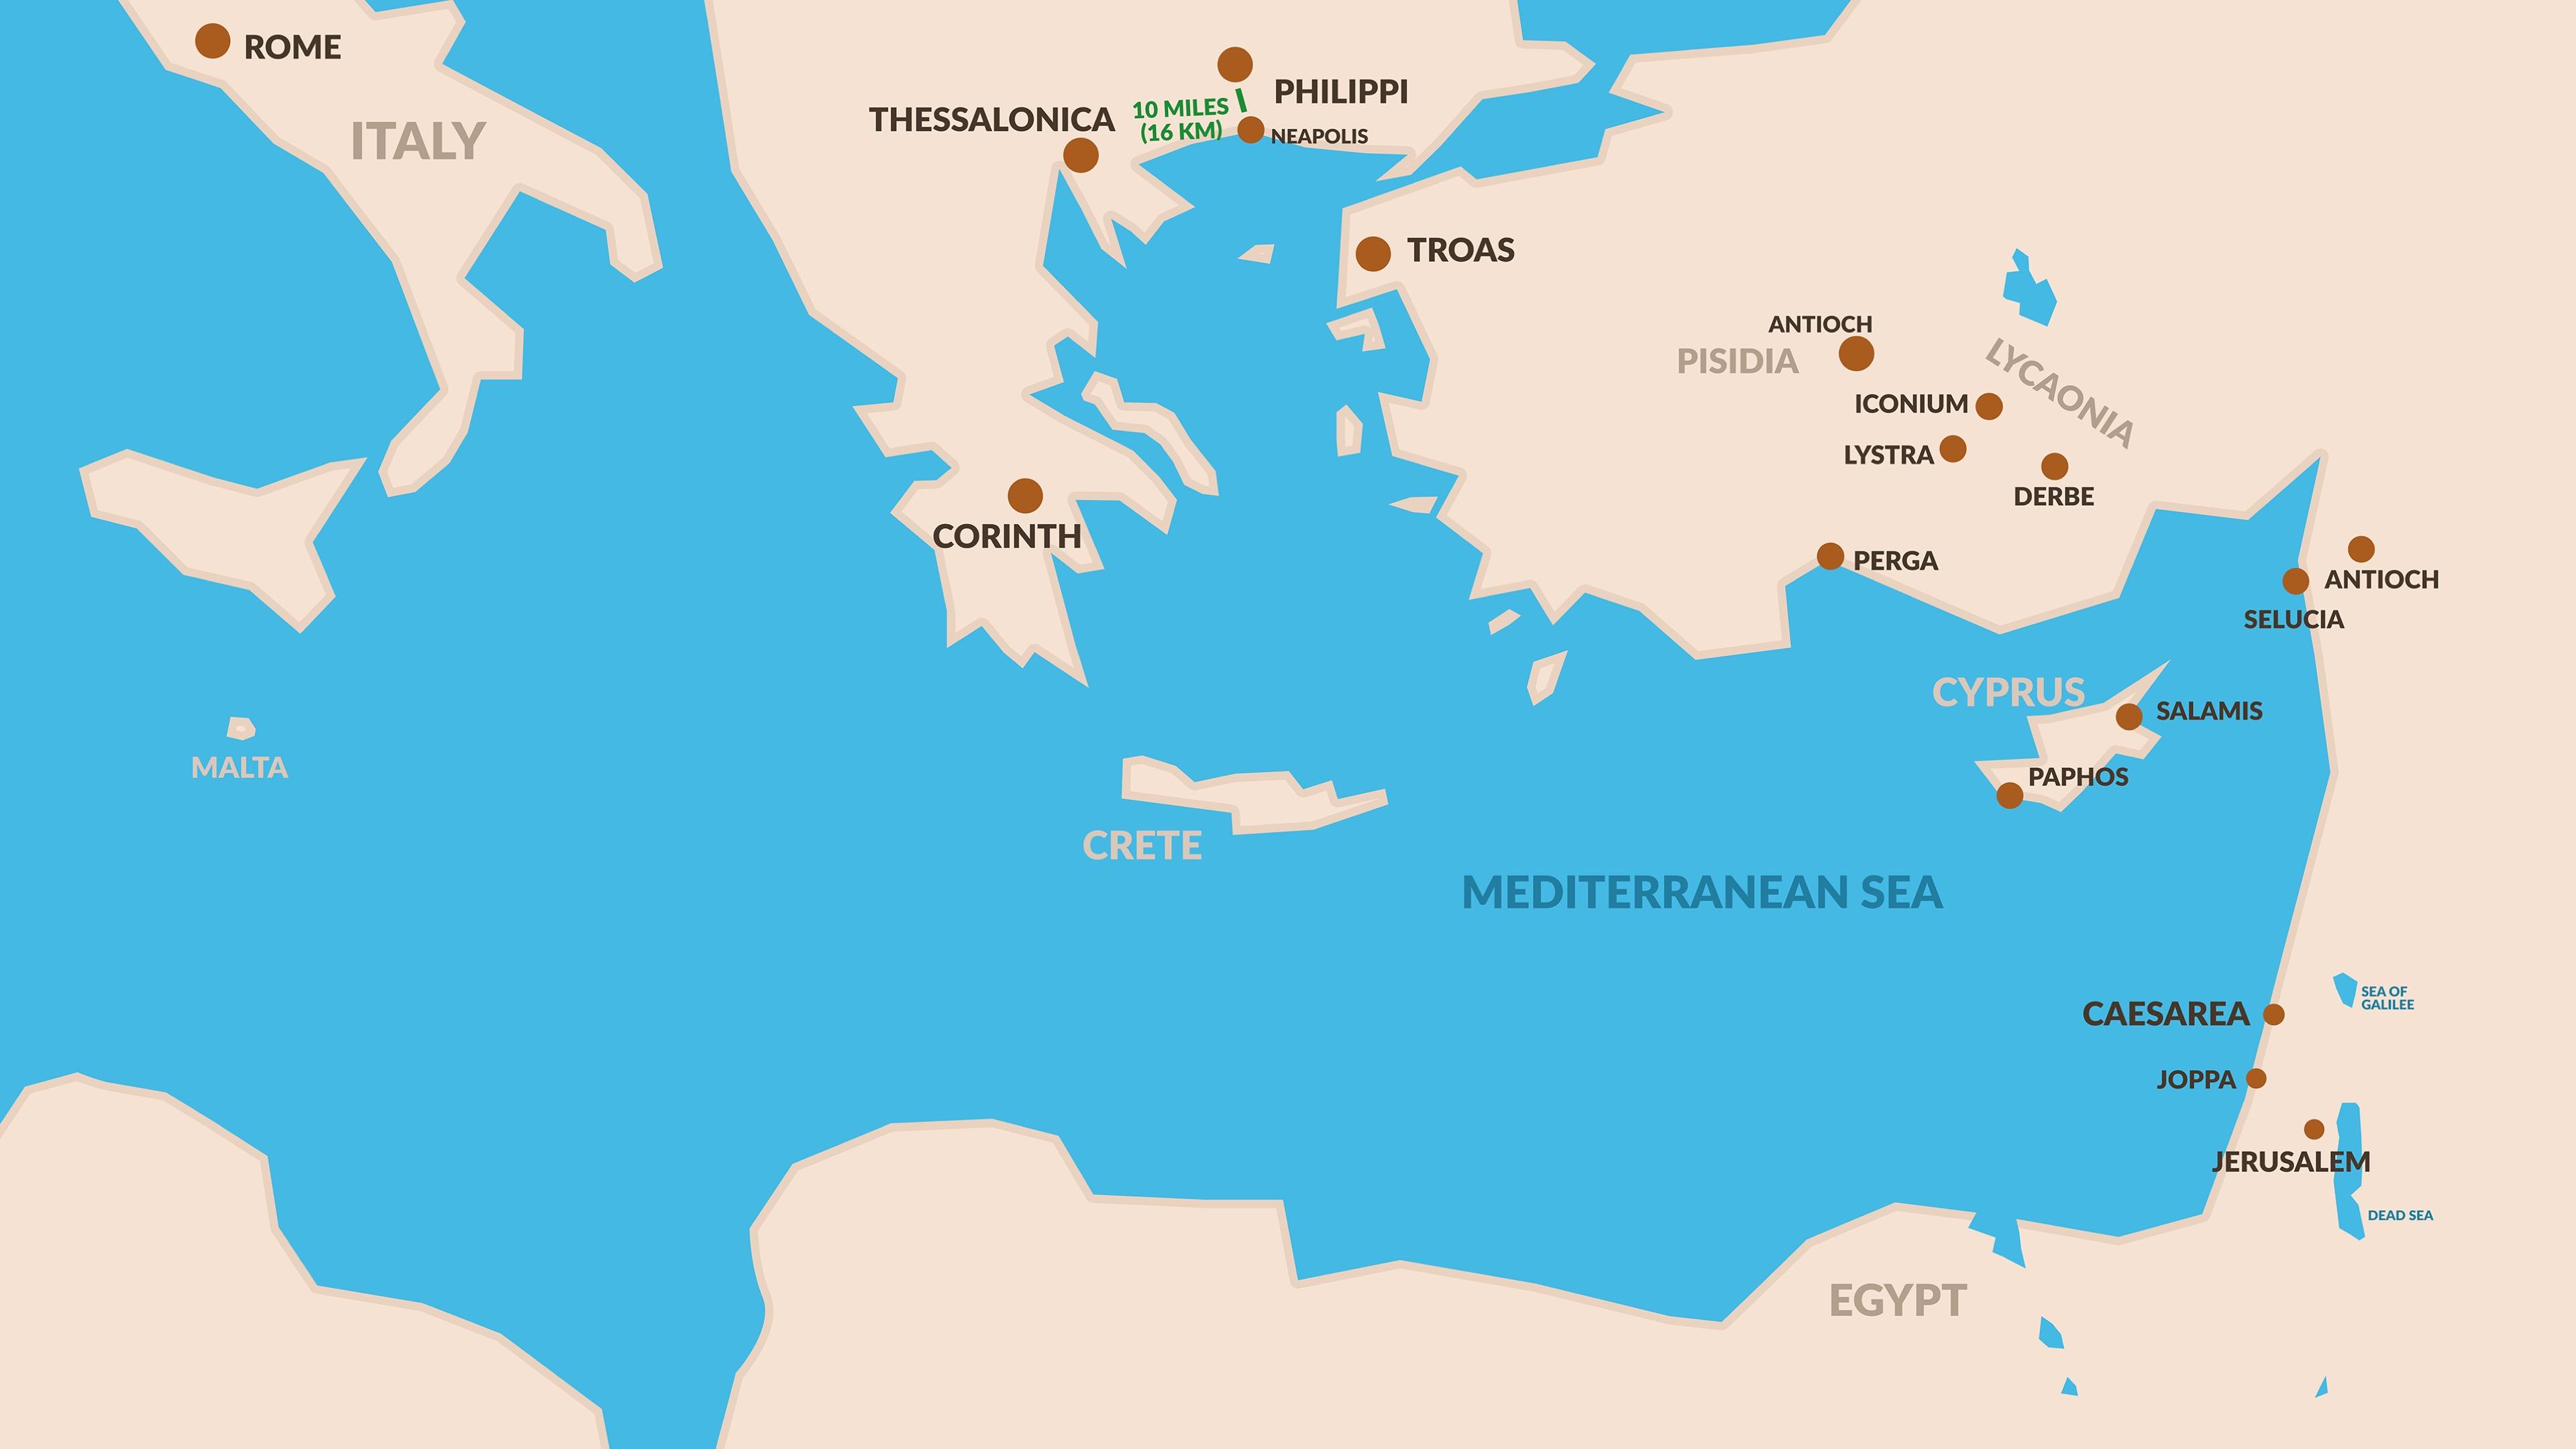 Introduction to Philippians | BibleTalk.tv on nazareth map, phoenicia map, capernaum map, jerusalem map, bible caesarea on a map, judea map, magdala map, qumran map, caesarea palaestina, azotus to caesarea map, mount of olives map, bethlehem map, chorazin map, antonia fortress map, philippi macedonia map, philippi bible map, colossae map, mt. tabor map, masada map, cyprus map, damascus map,